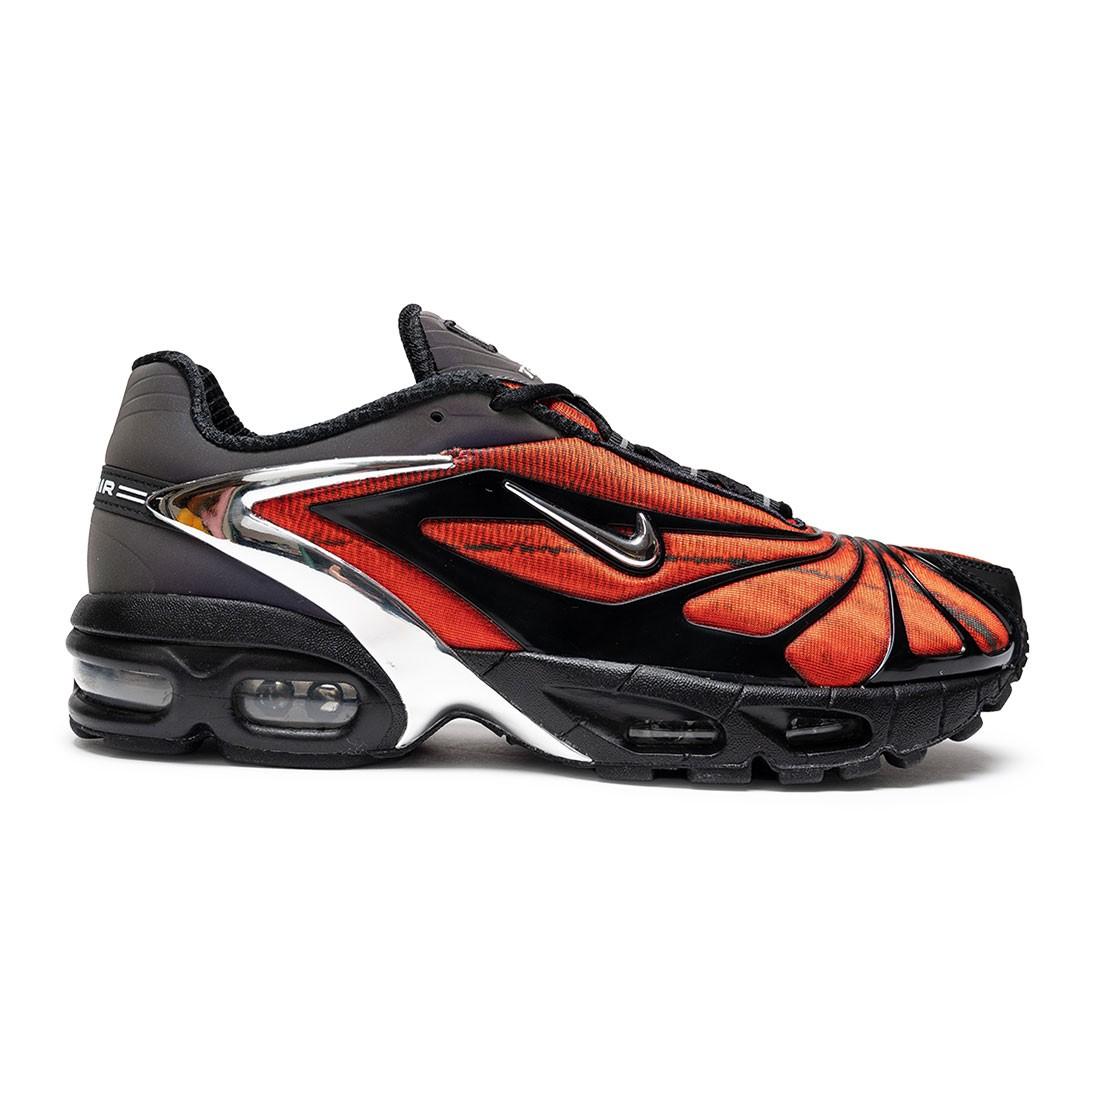 Nike X Skepta Men Air Max Tailwind V (black / chrome-red)